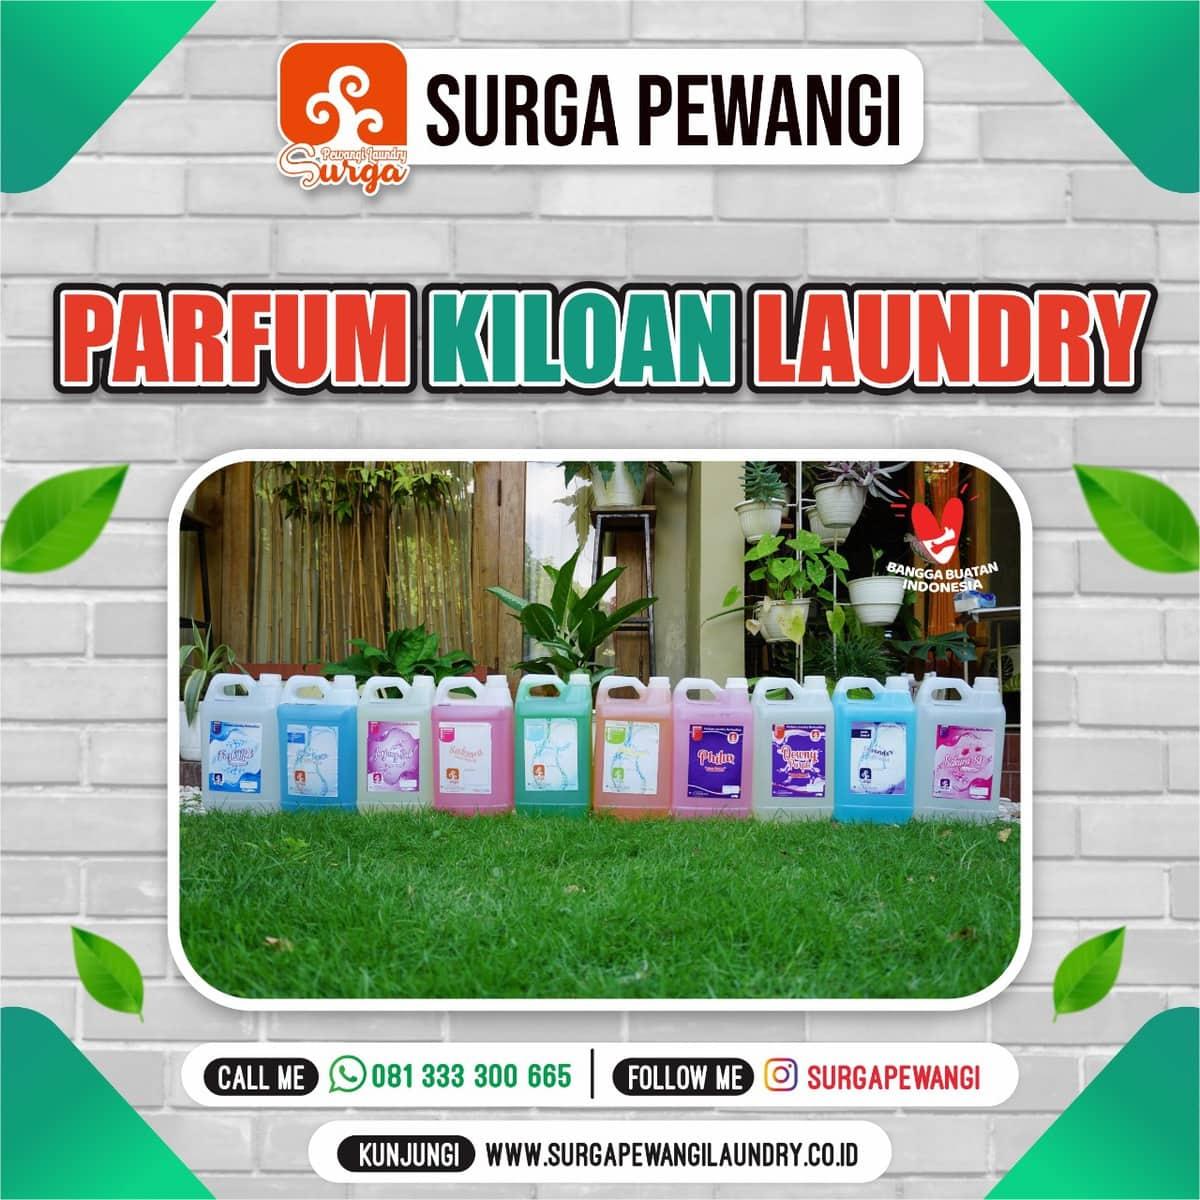 PHOTO 2020 11 26 08 25 26 1 - Bisnis Anti Boncos Yuk Buka Usaha Laundry Kiloan Terdekat